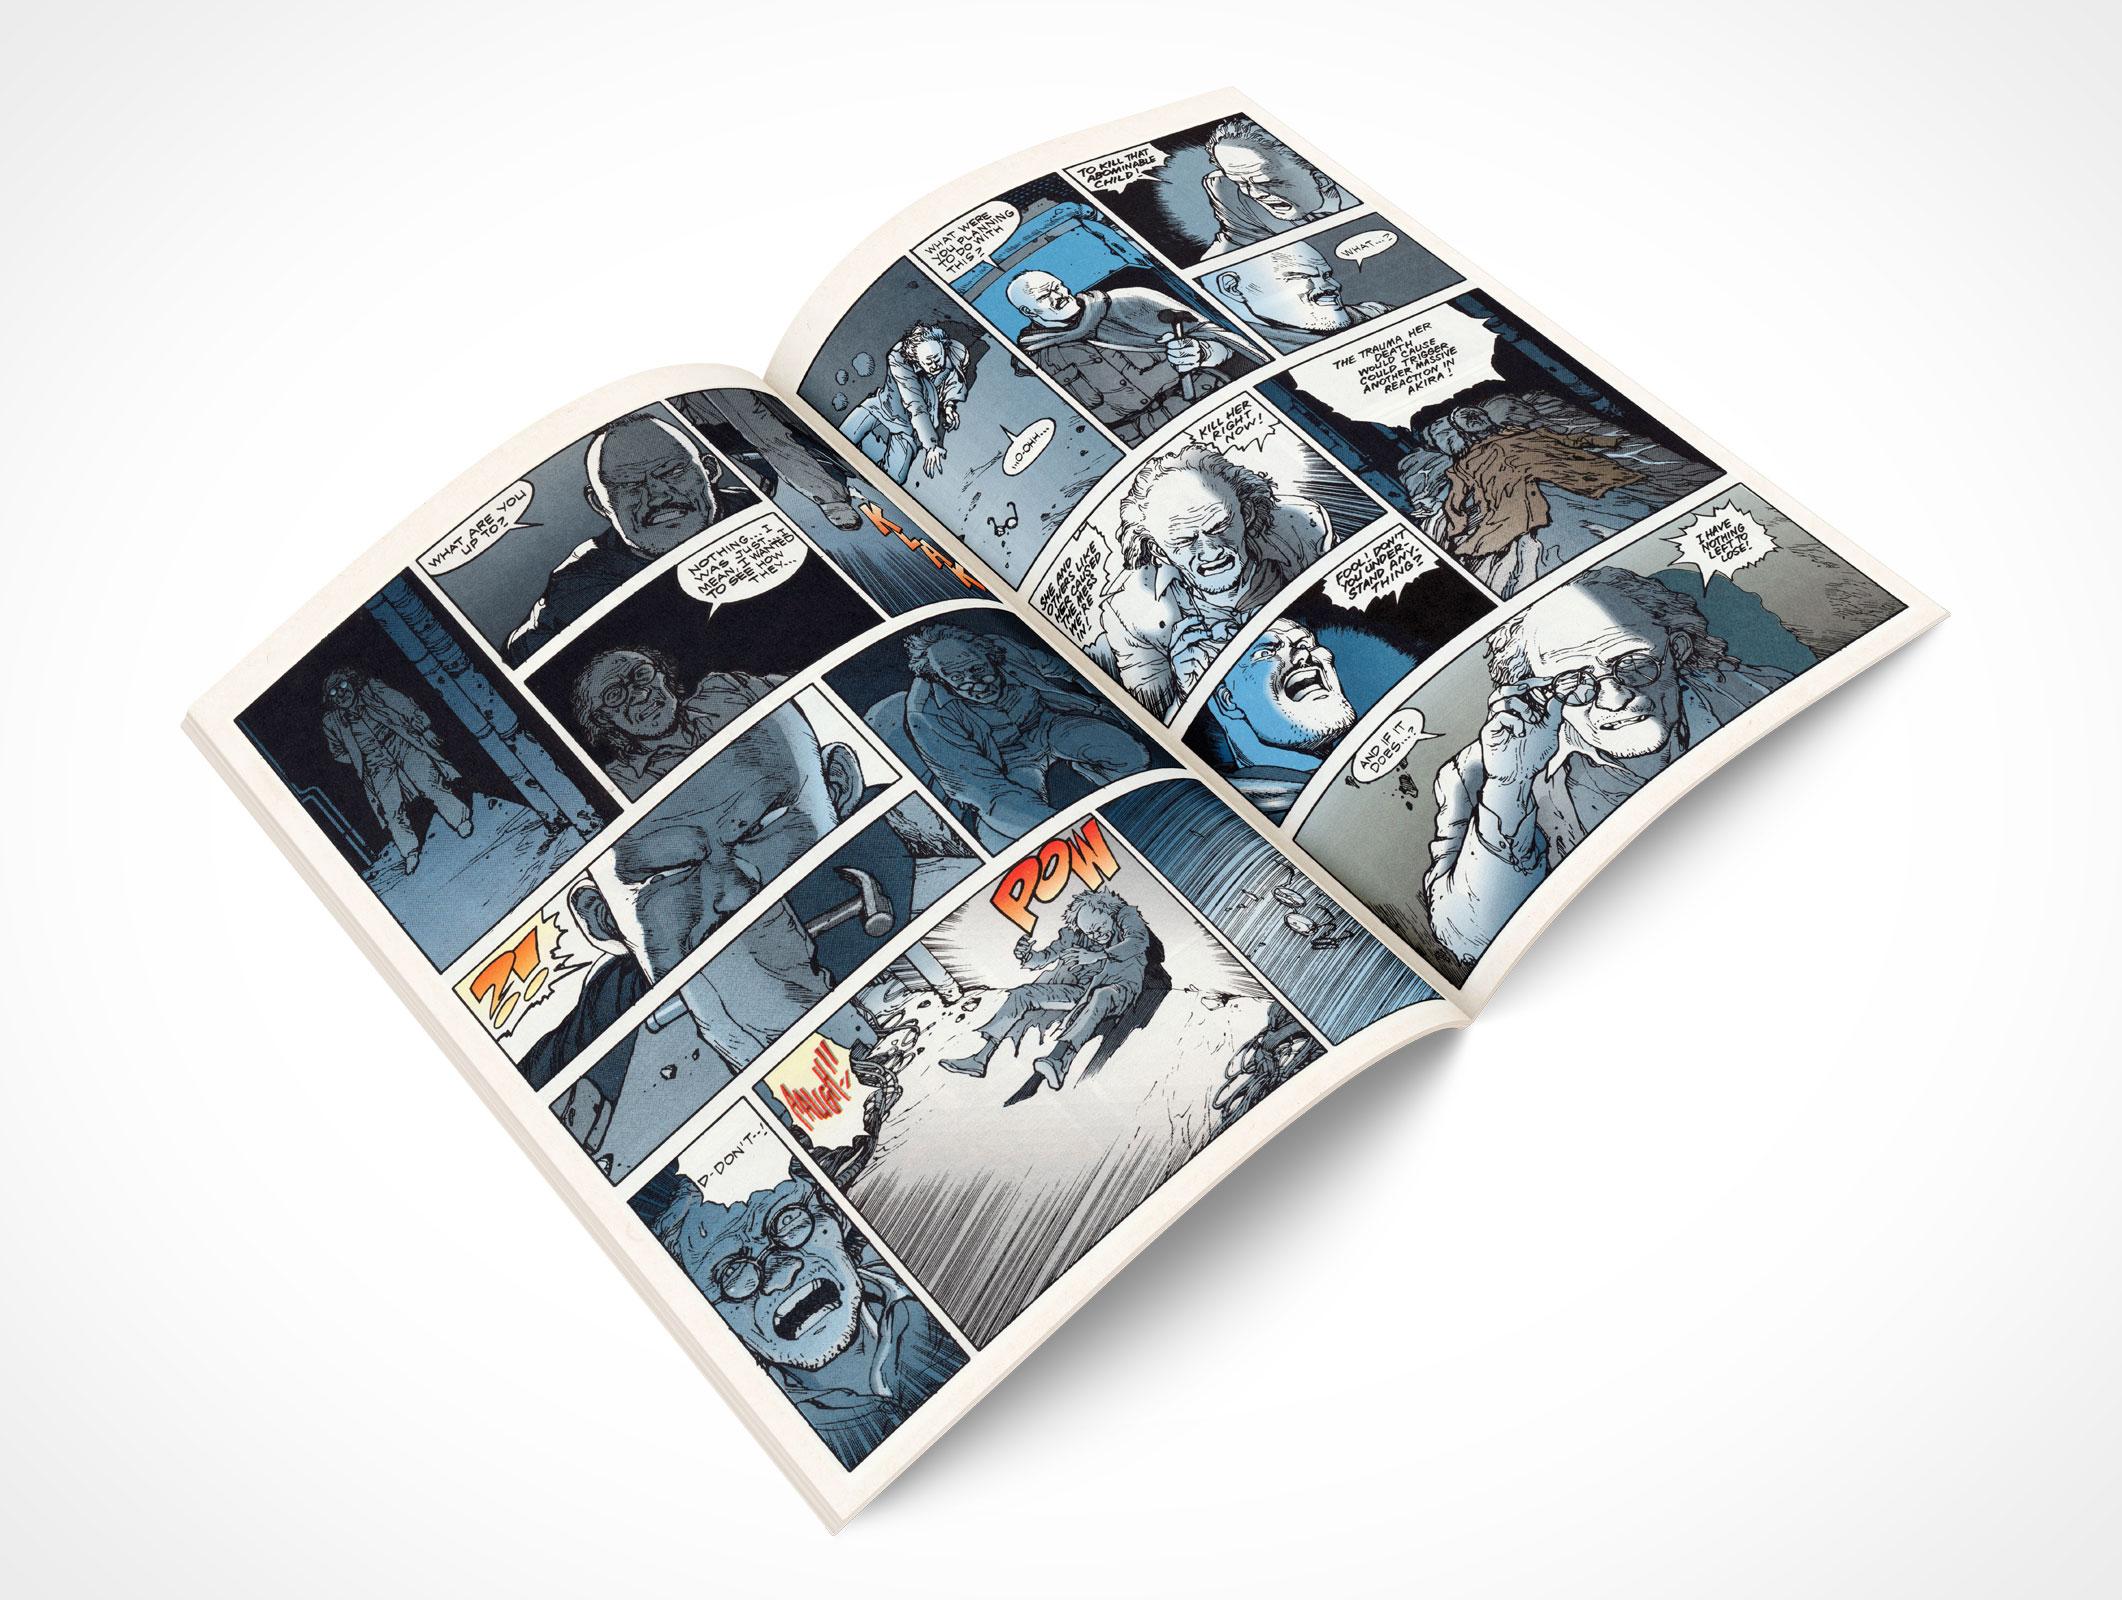 COMICBOOK012r4